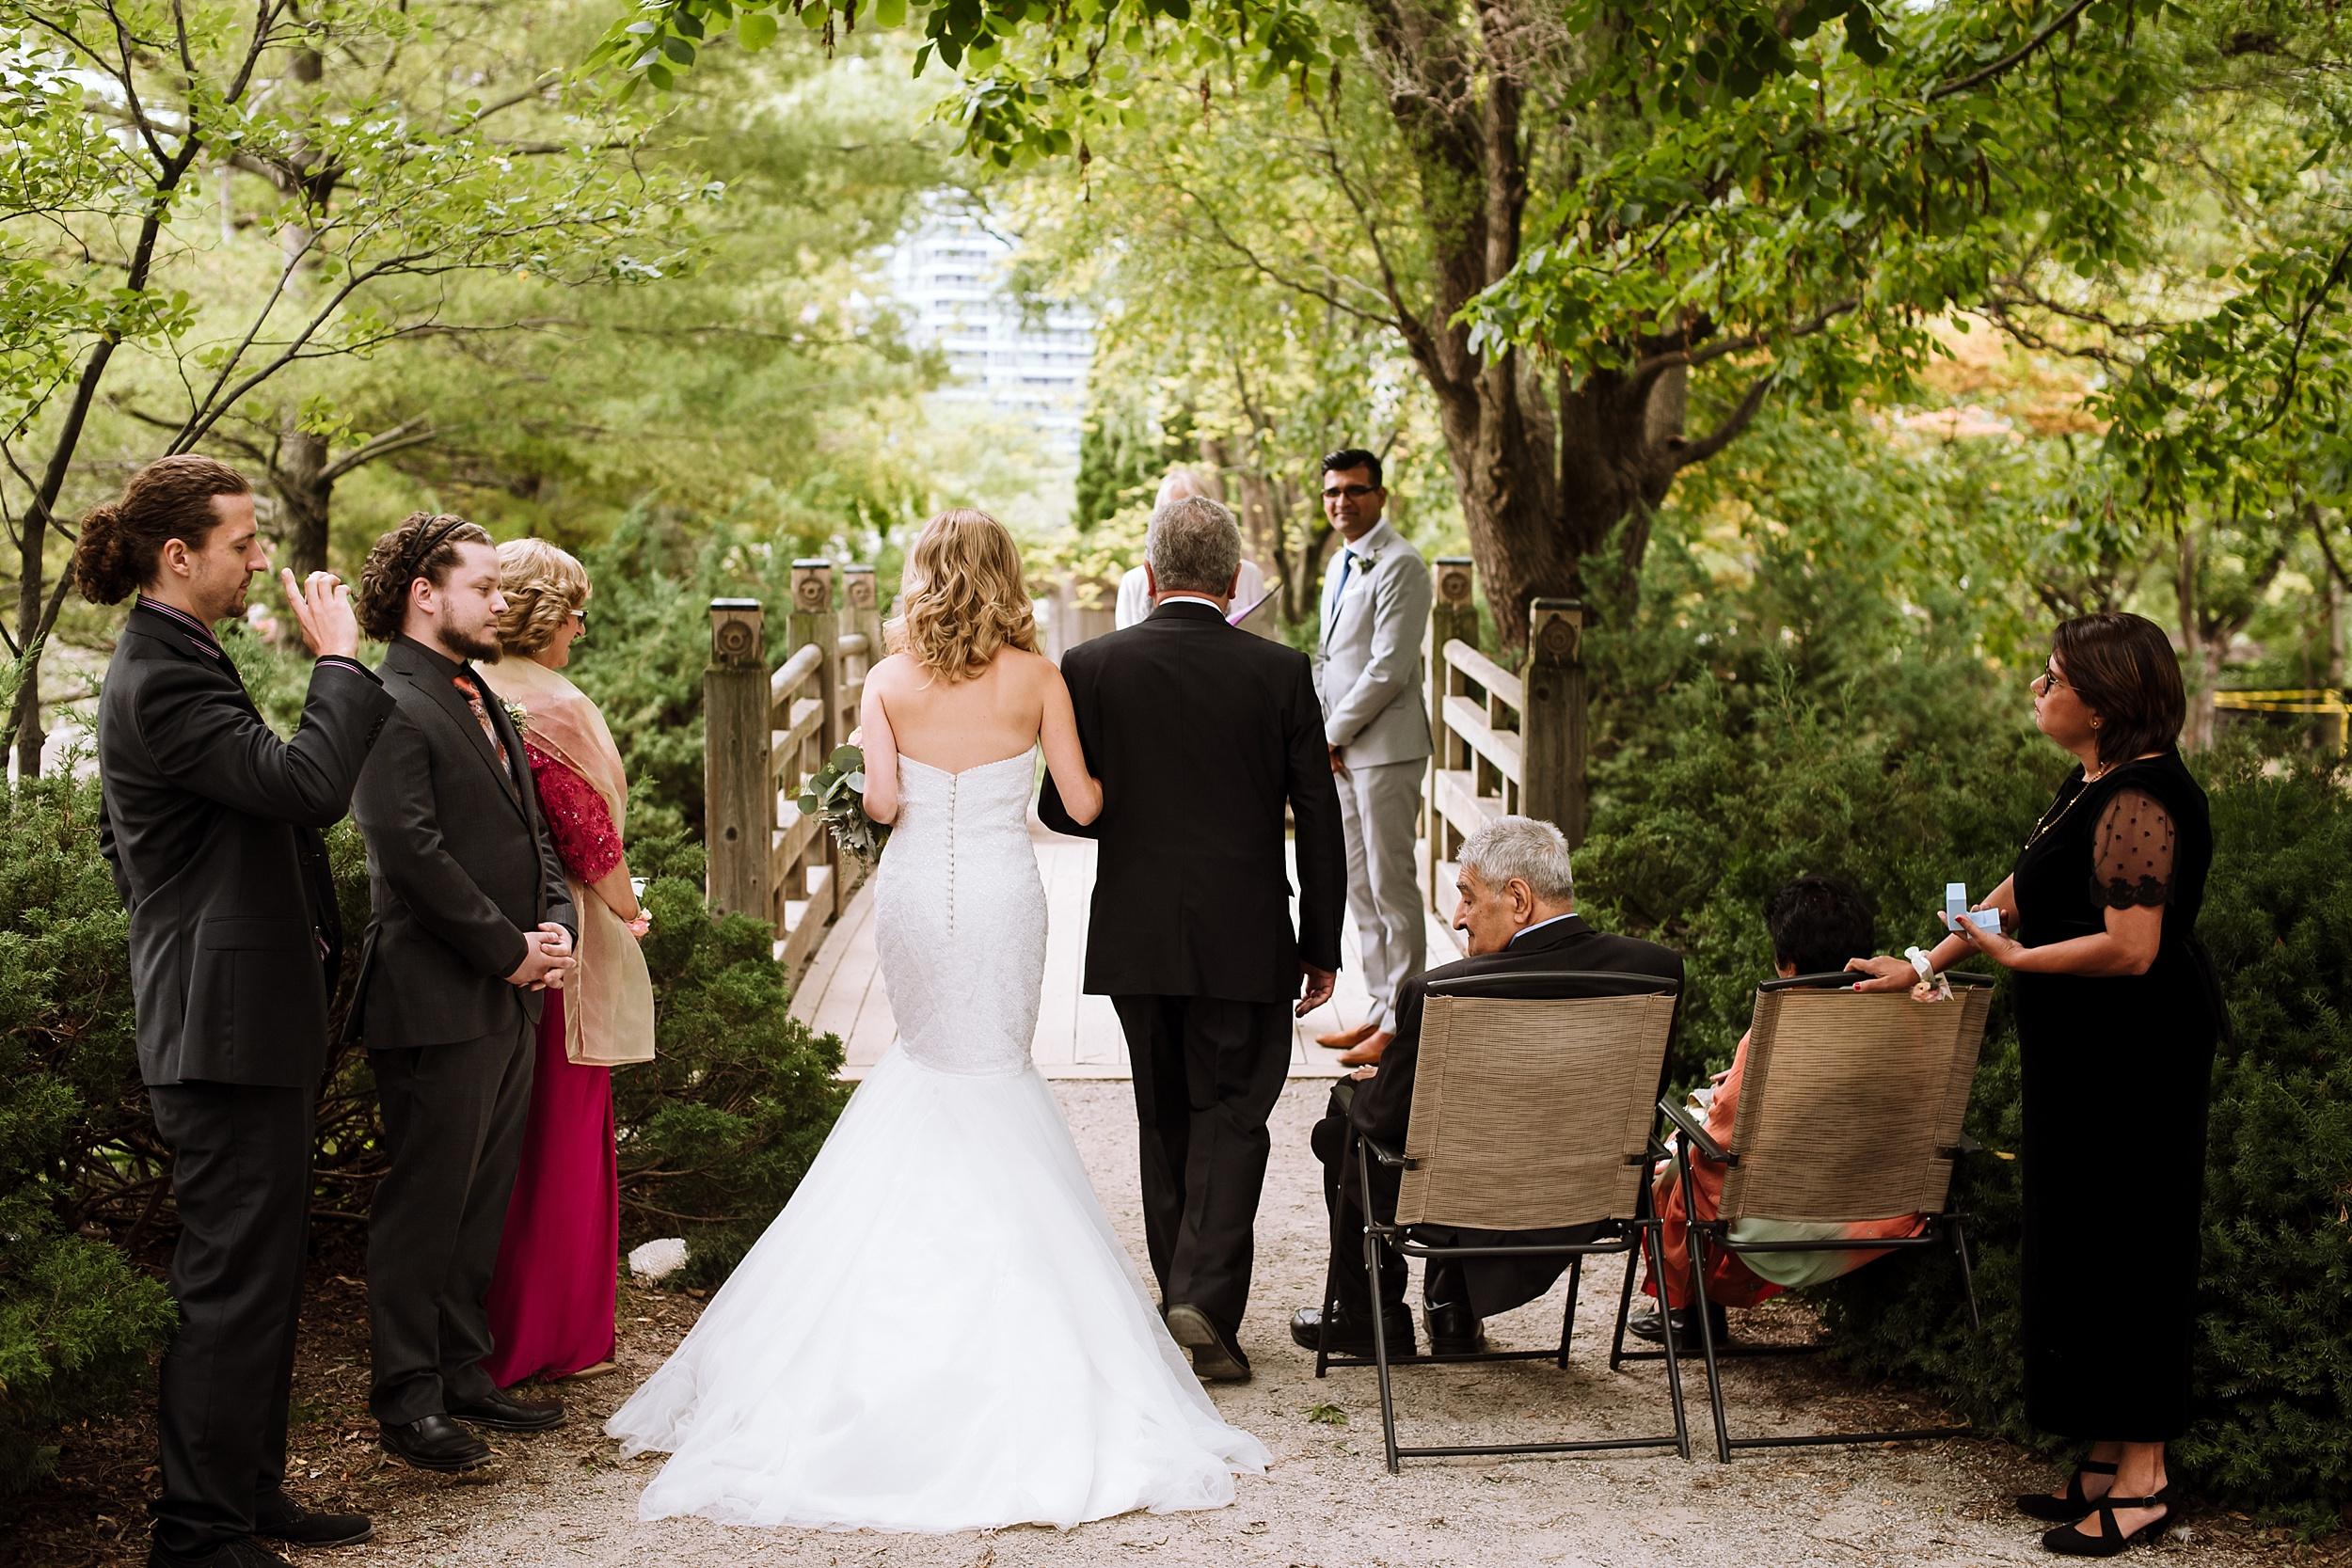 Kariya_Park_Wedding_Shoot_Toronto_Photographer_0047.jpg